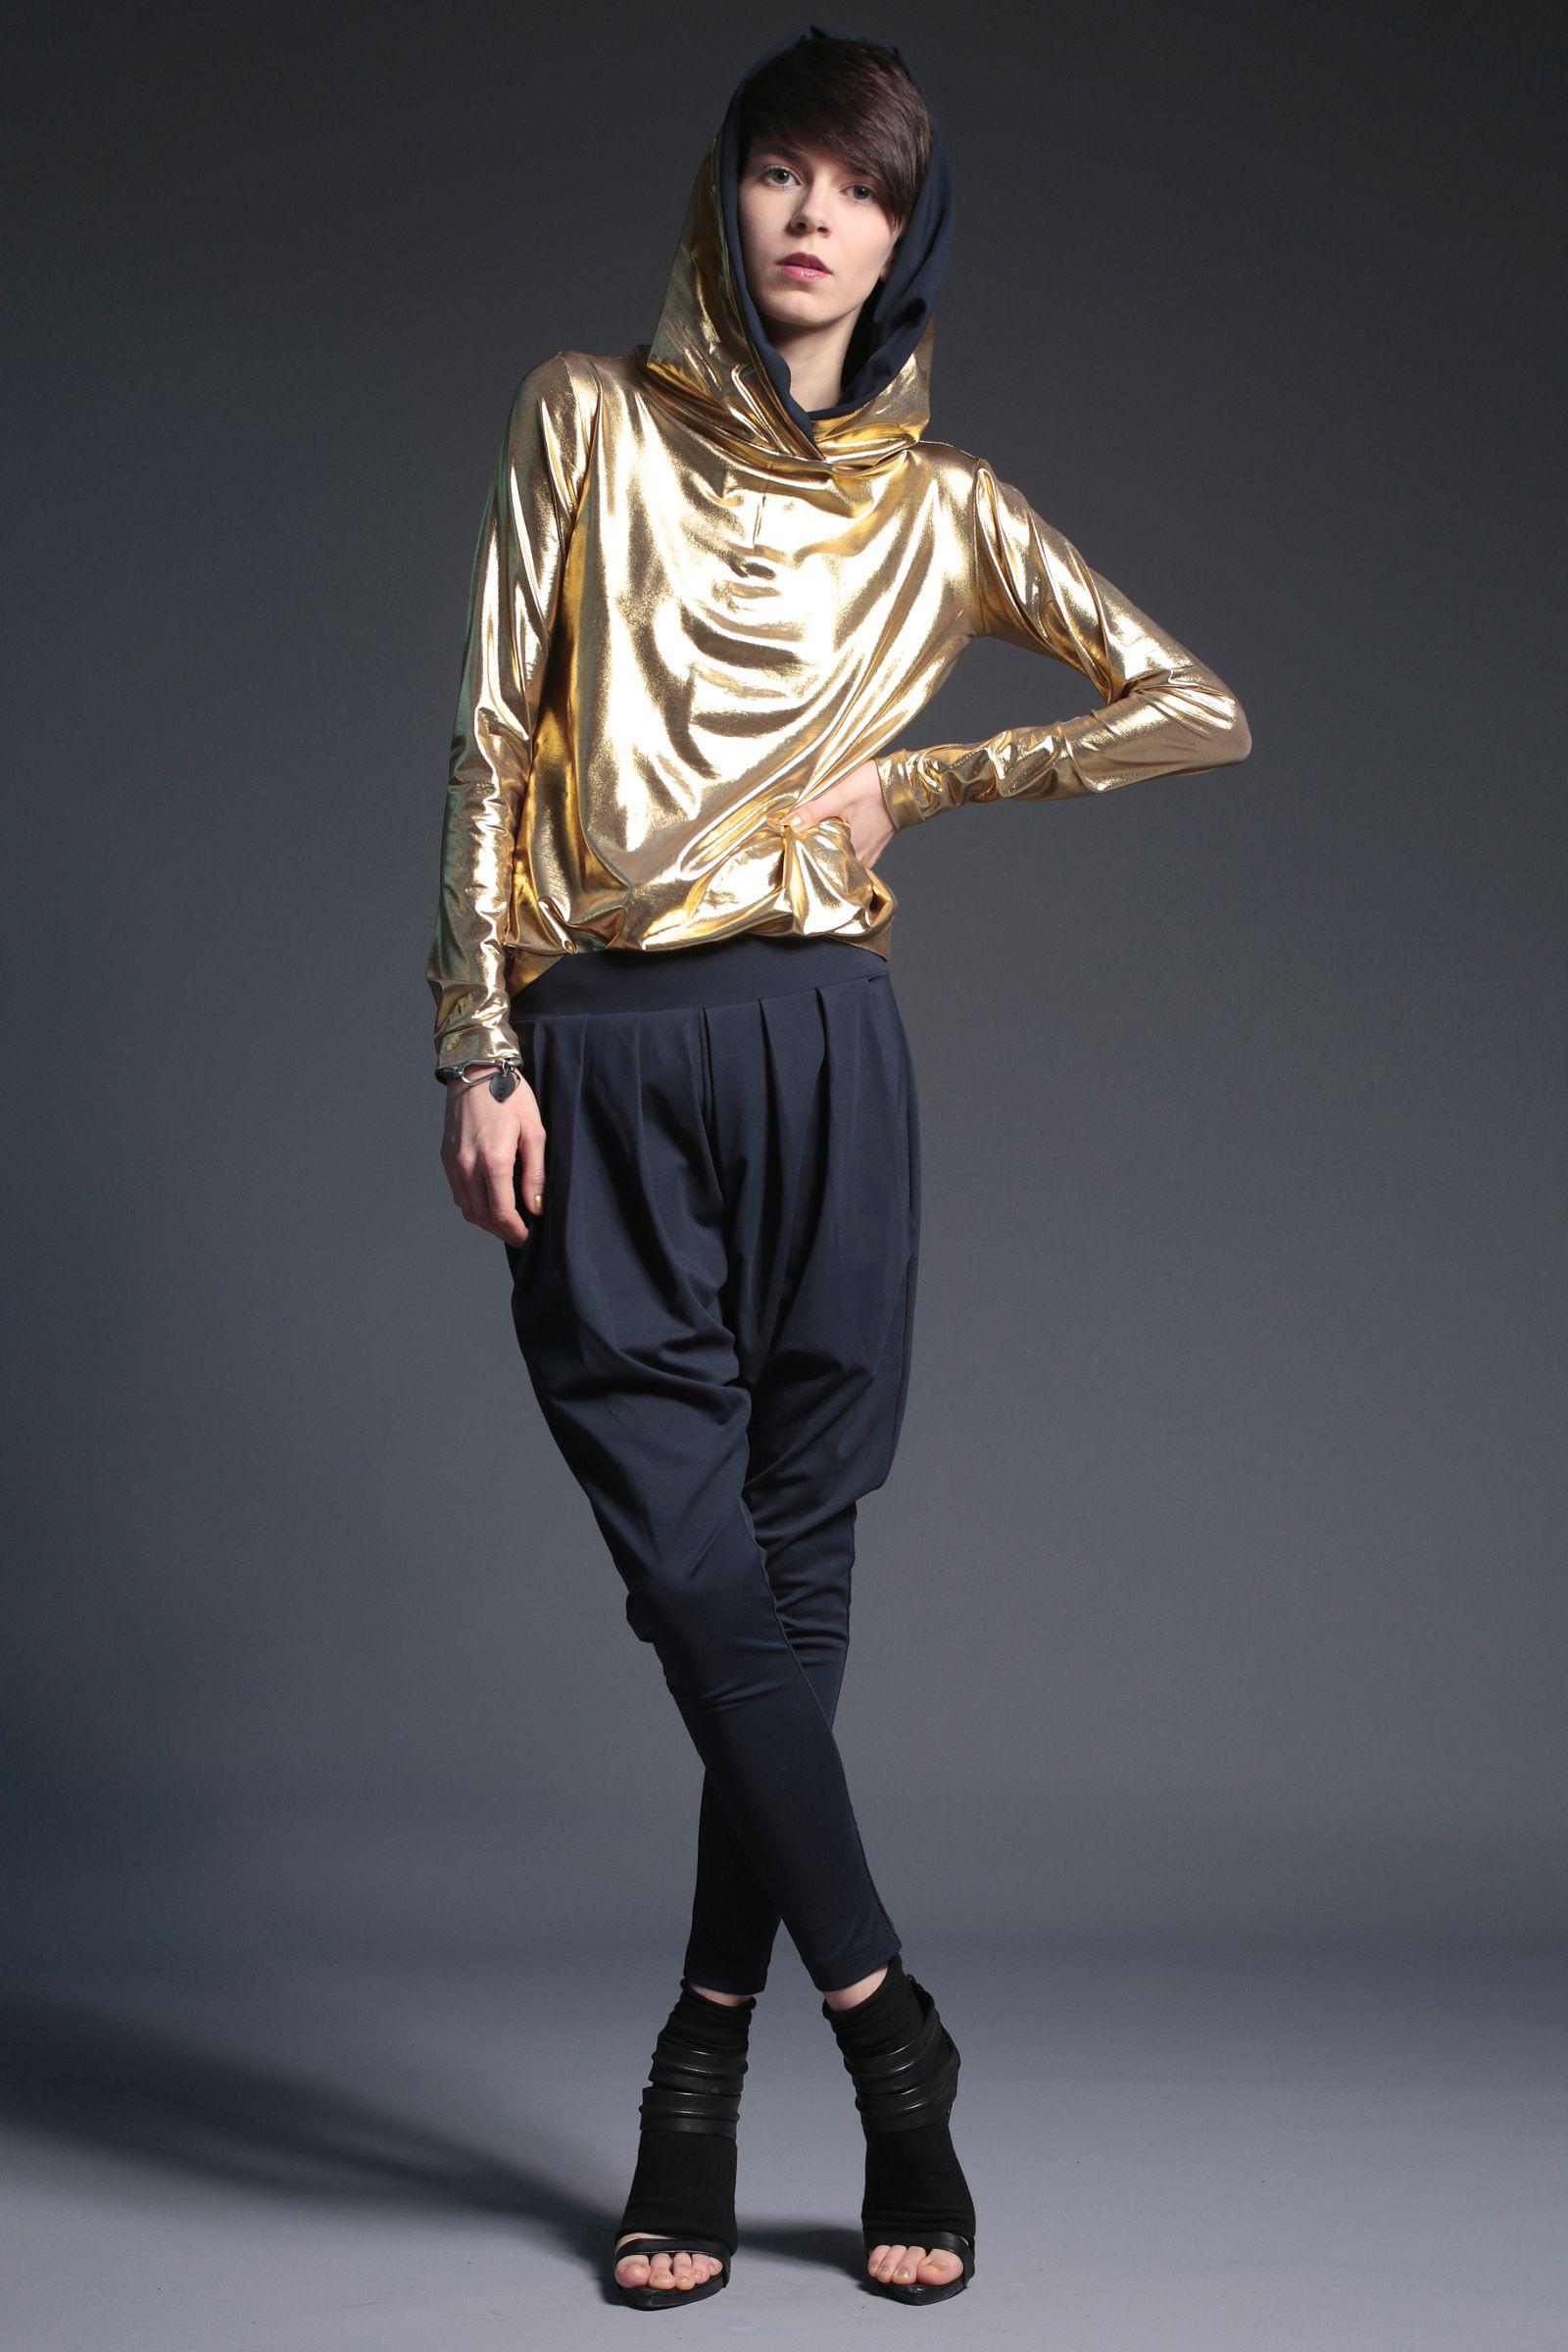 #fashion #woman #womansfashion #gold #hoodie  buy on www.magdahasiak.com